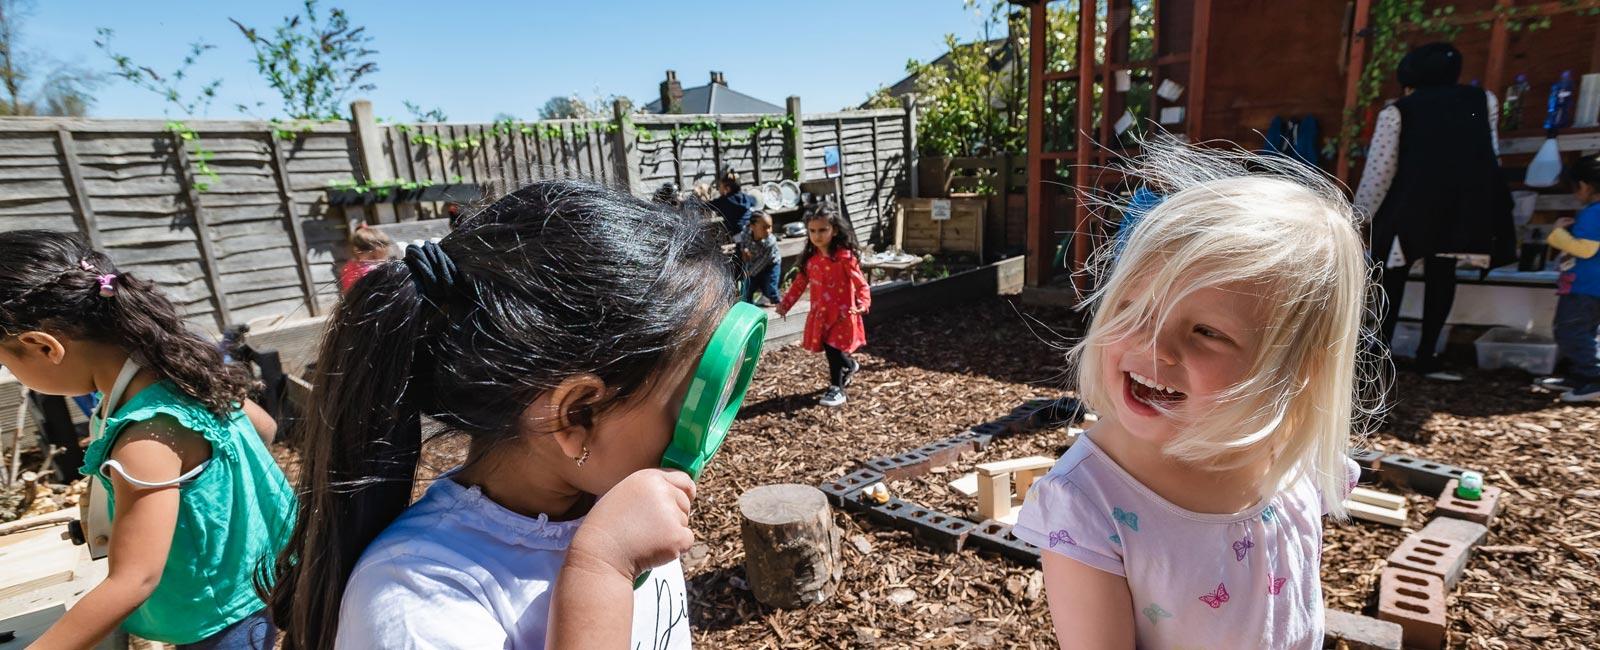 Leaps & Bounds Day Nursery & Forest School (Edgbaston, Birmingham)